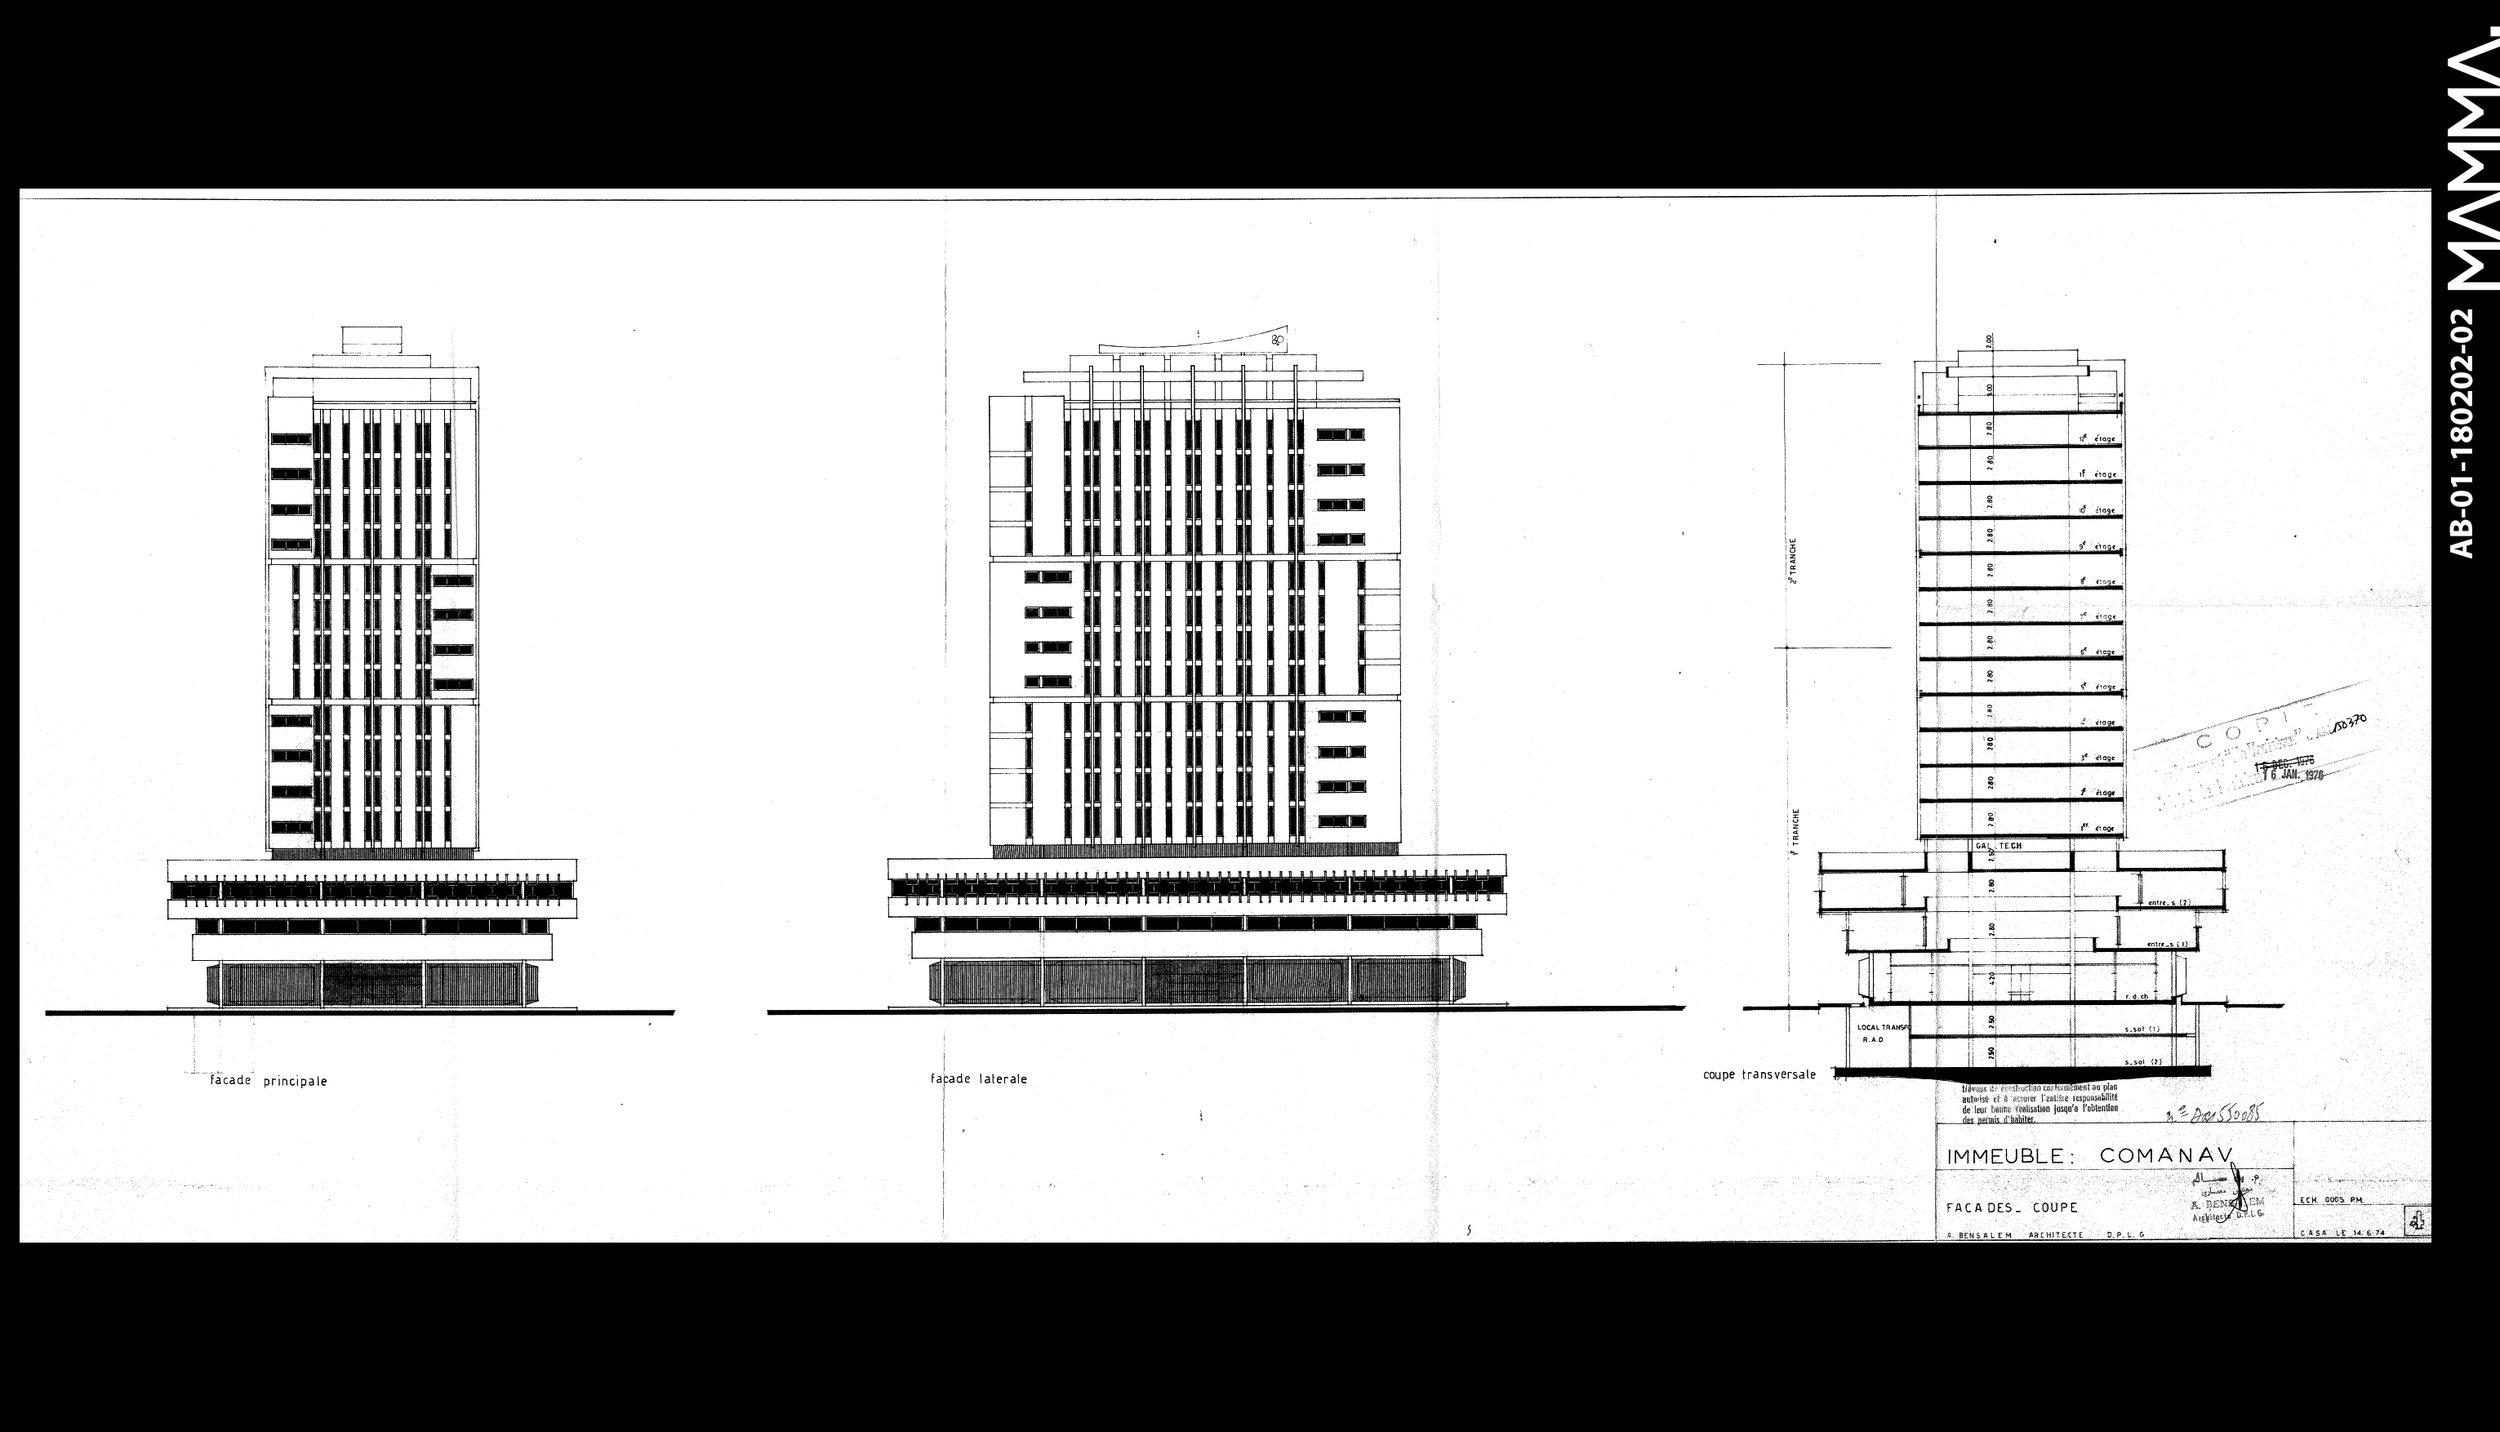 1974-La COMANAV   Agence: Abdelkader Abdeslem  Contenu: Coupe, Façades  Dimensions: 103,81 x 44,7 cm      © MAMMAARCHIVE   Réf: MAMMA- AB-01-180202-02